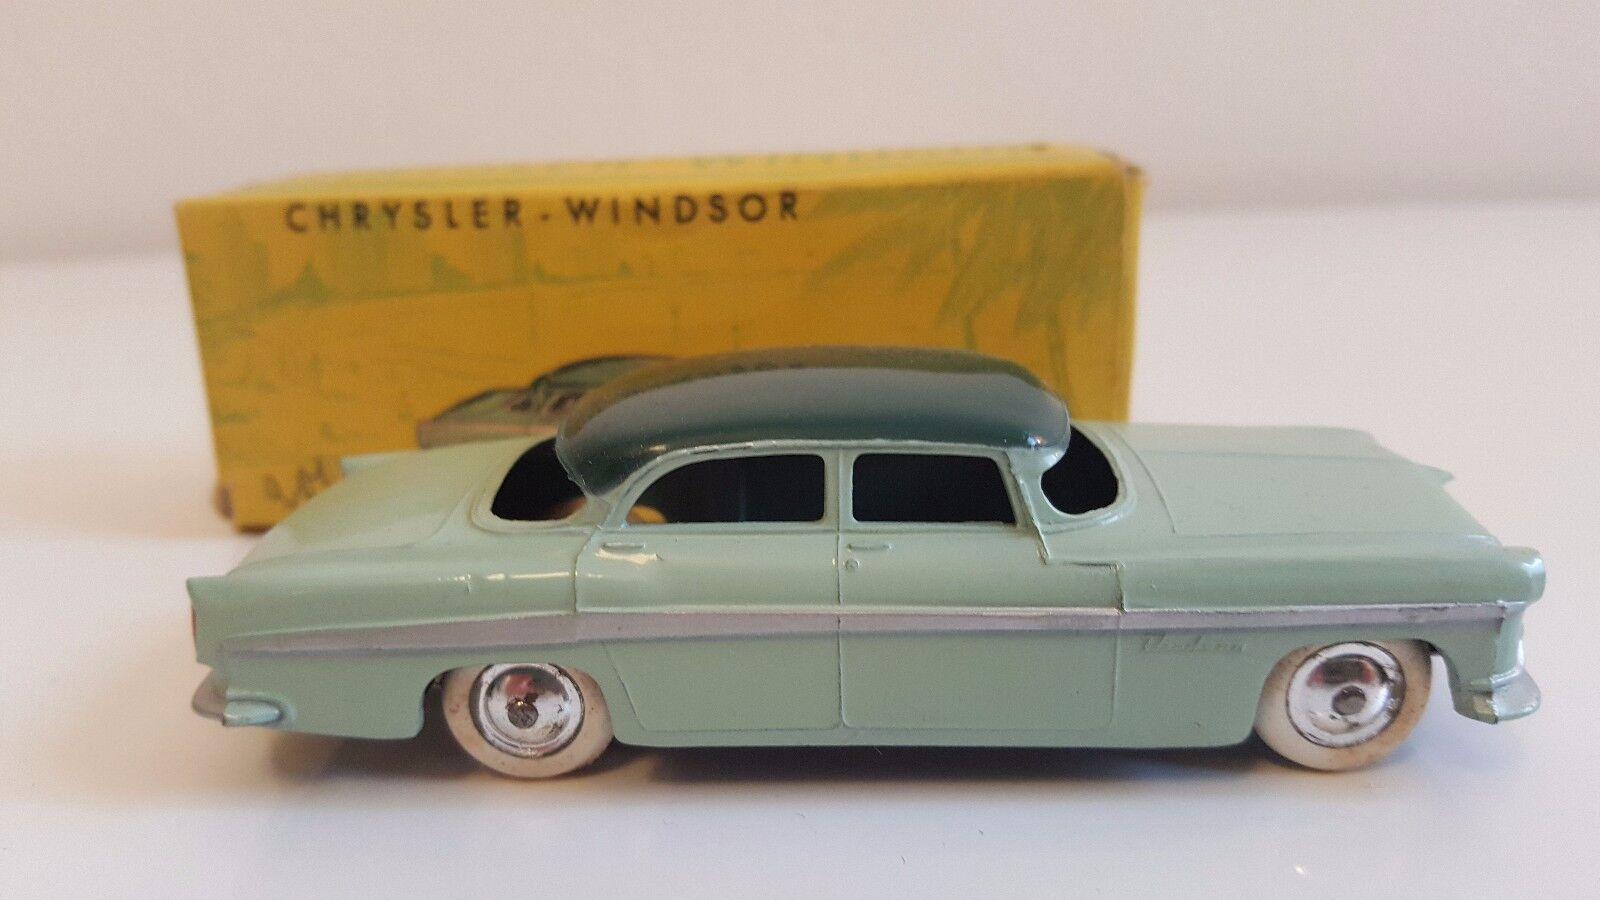 CIJ  315  Chrysler Windsor en boîte d'origine Années 60 VN Mib